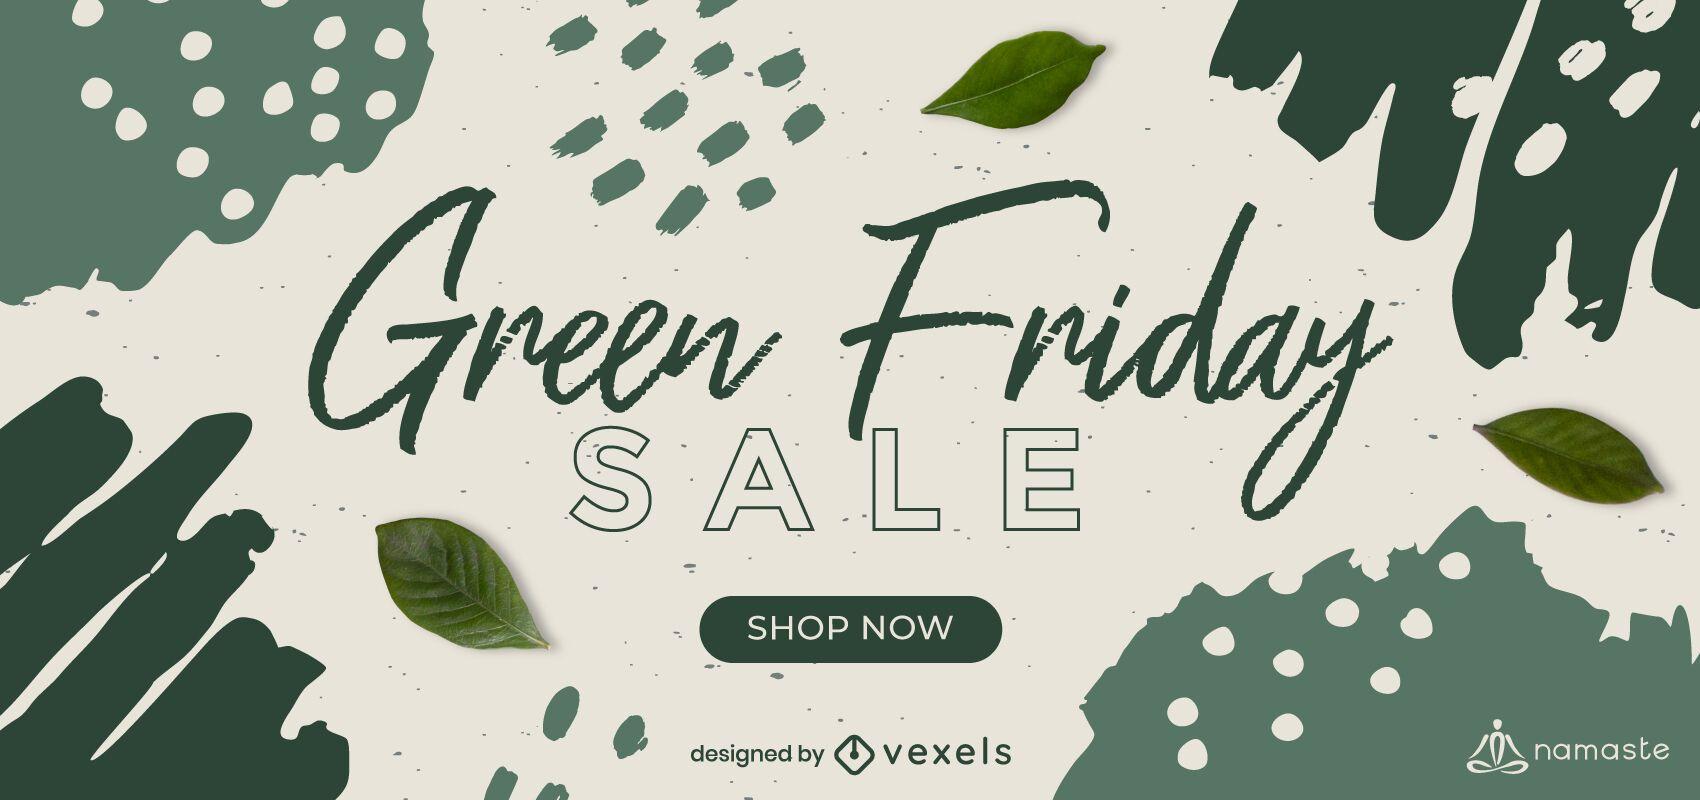 Green friday sale slider template